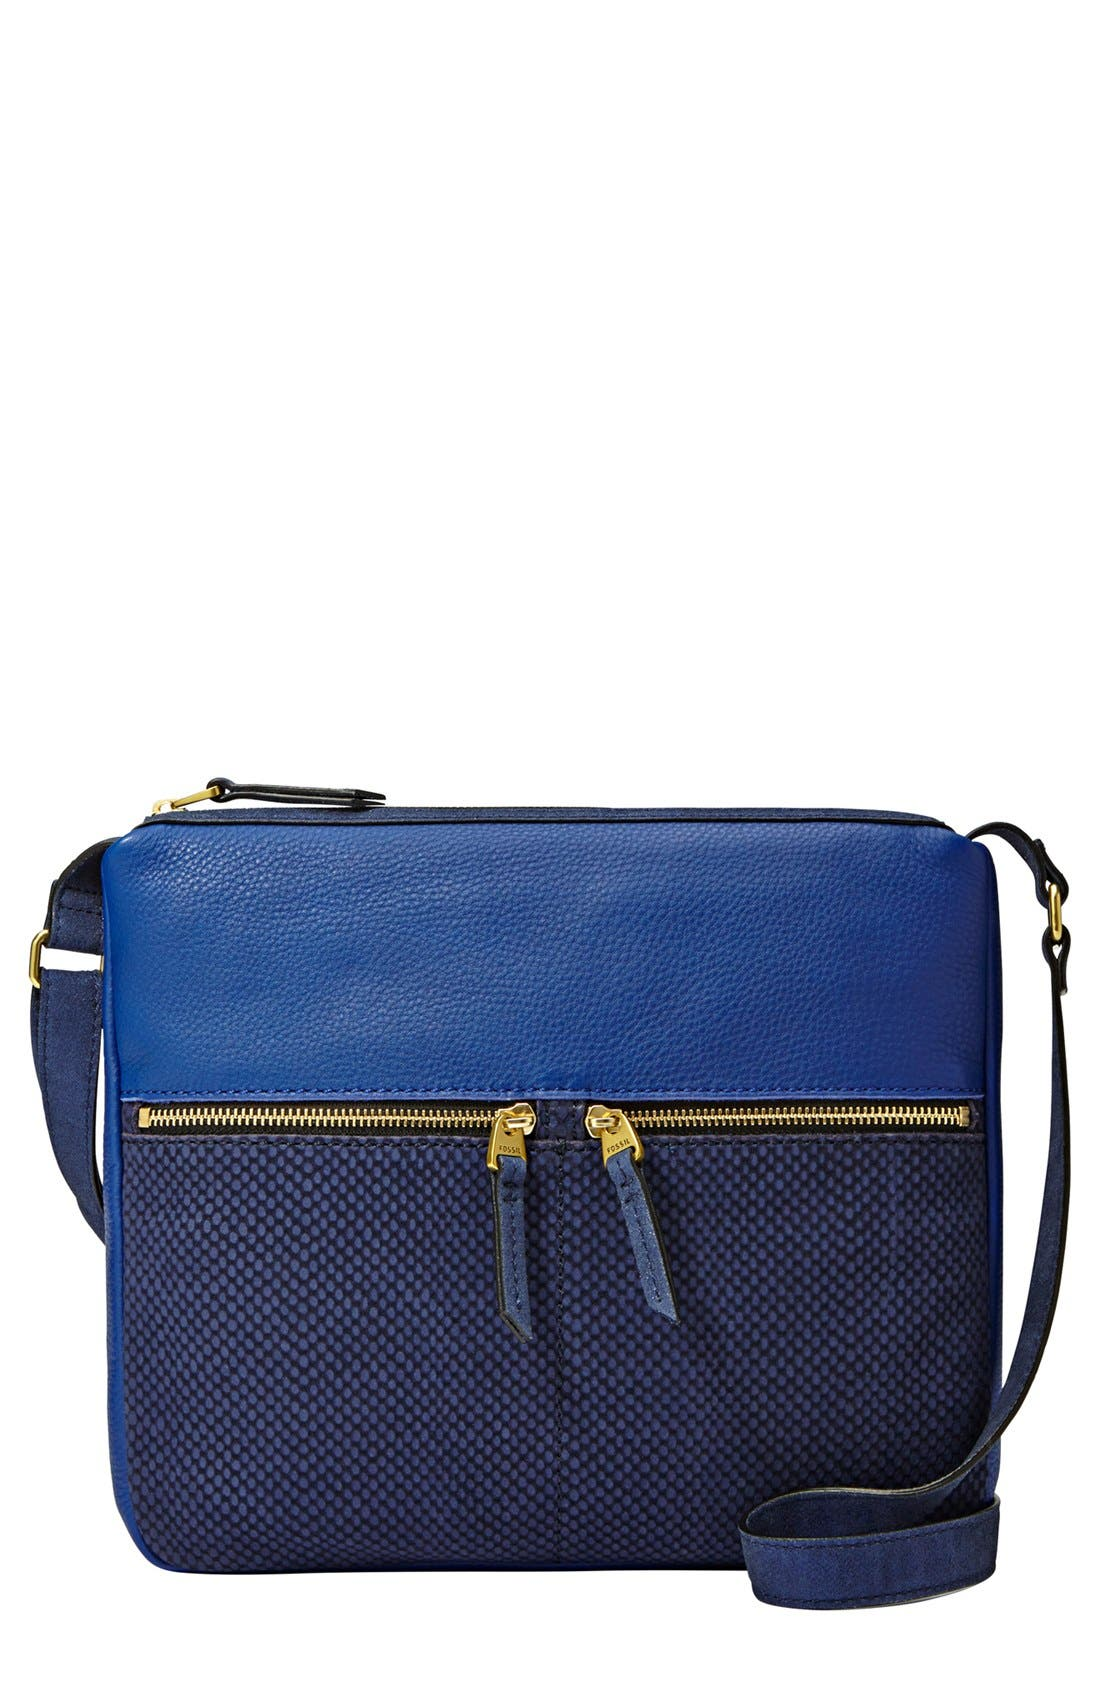 Main Image - Fossil 'Erin' Crossbody Bag